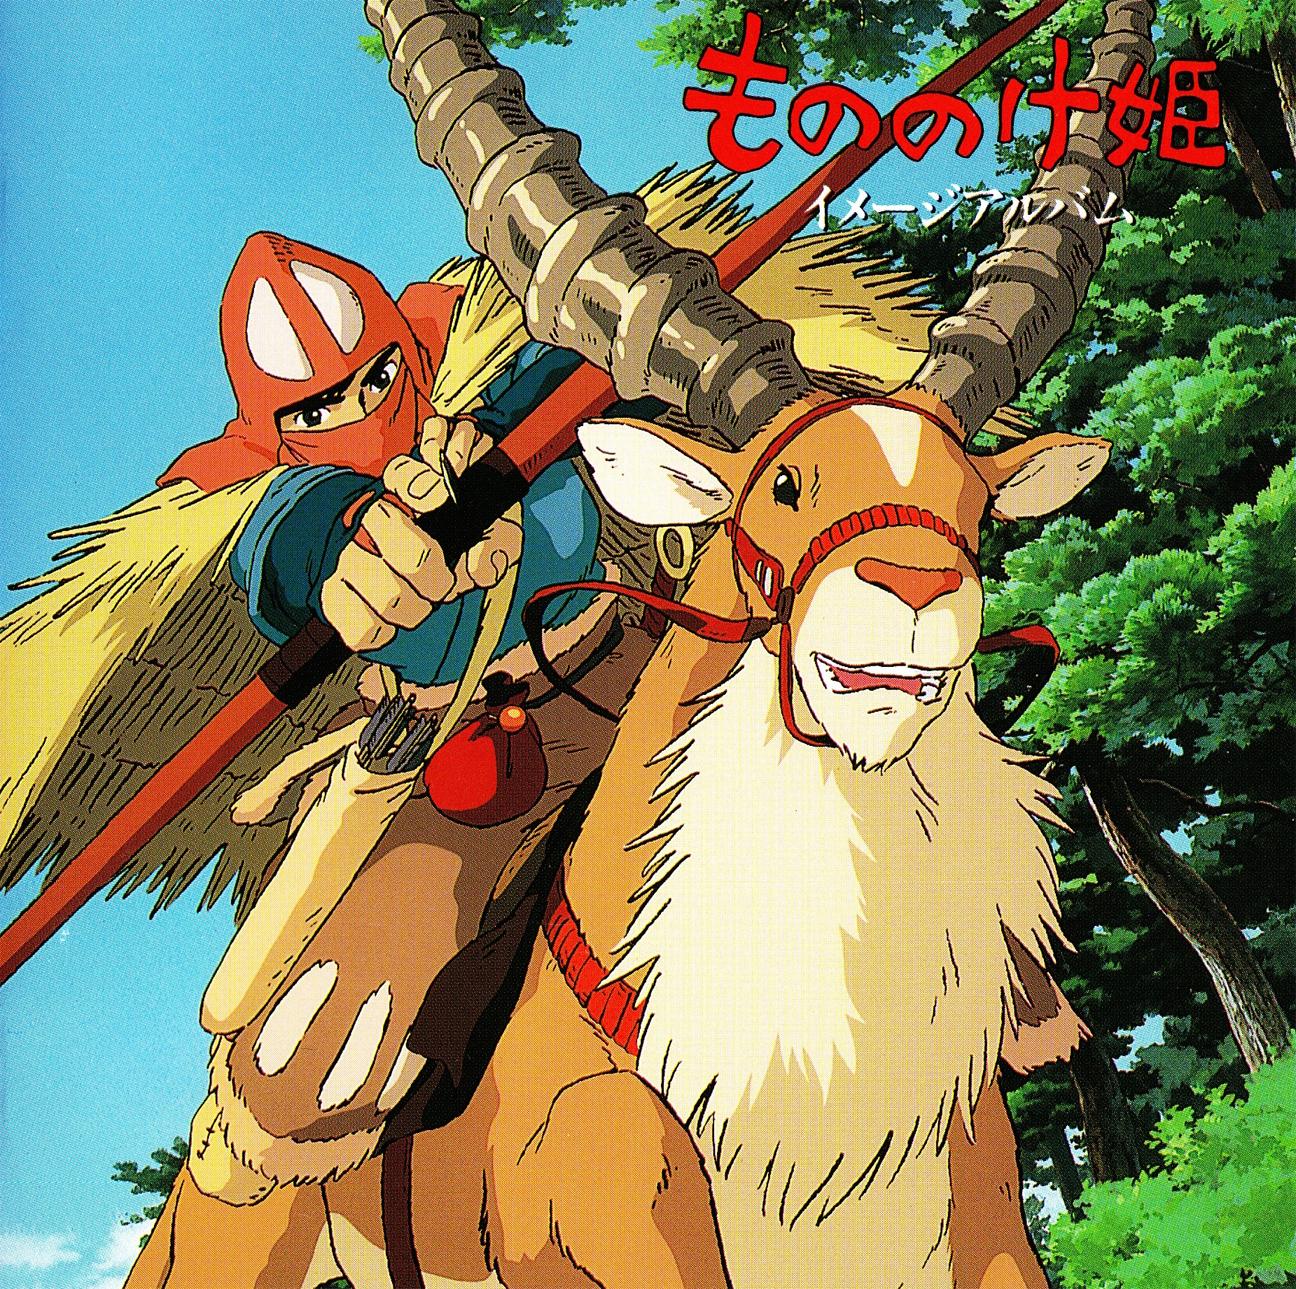 Prince Ashitaka - Mononoke Hime - Image #126255 - Zerochan Anime Image Board